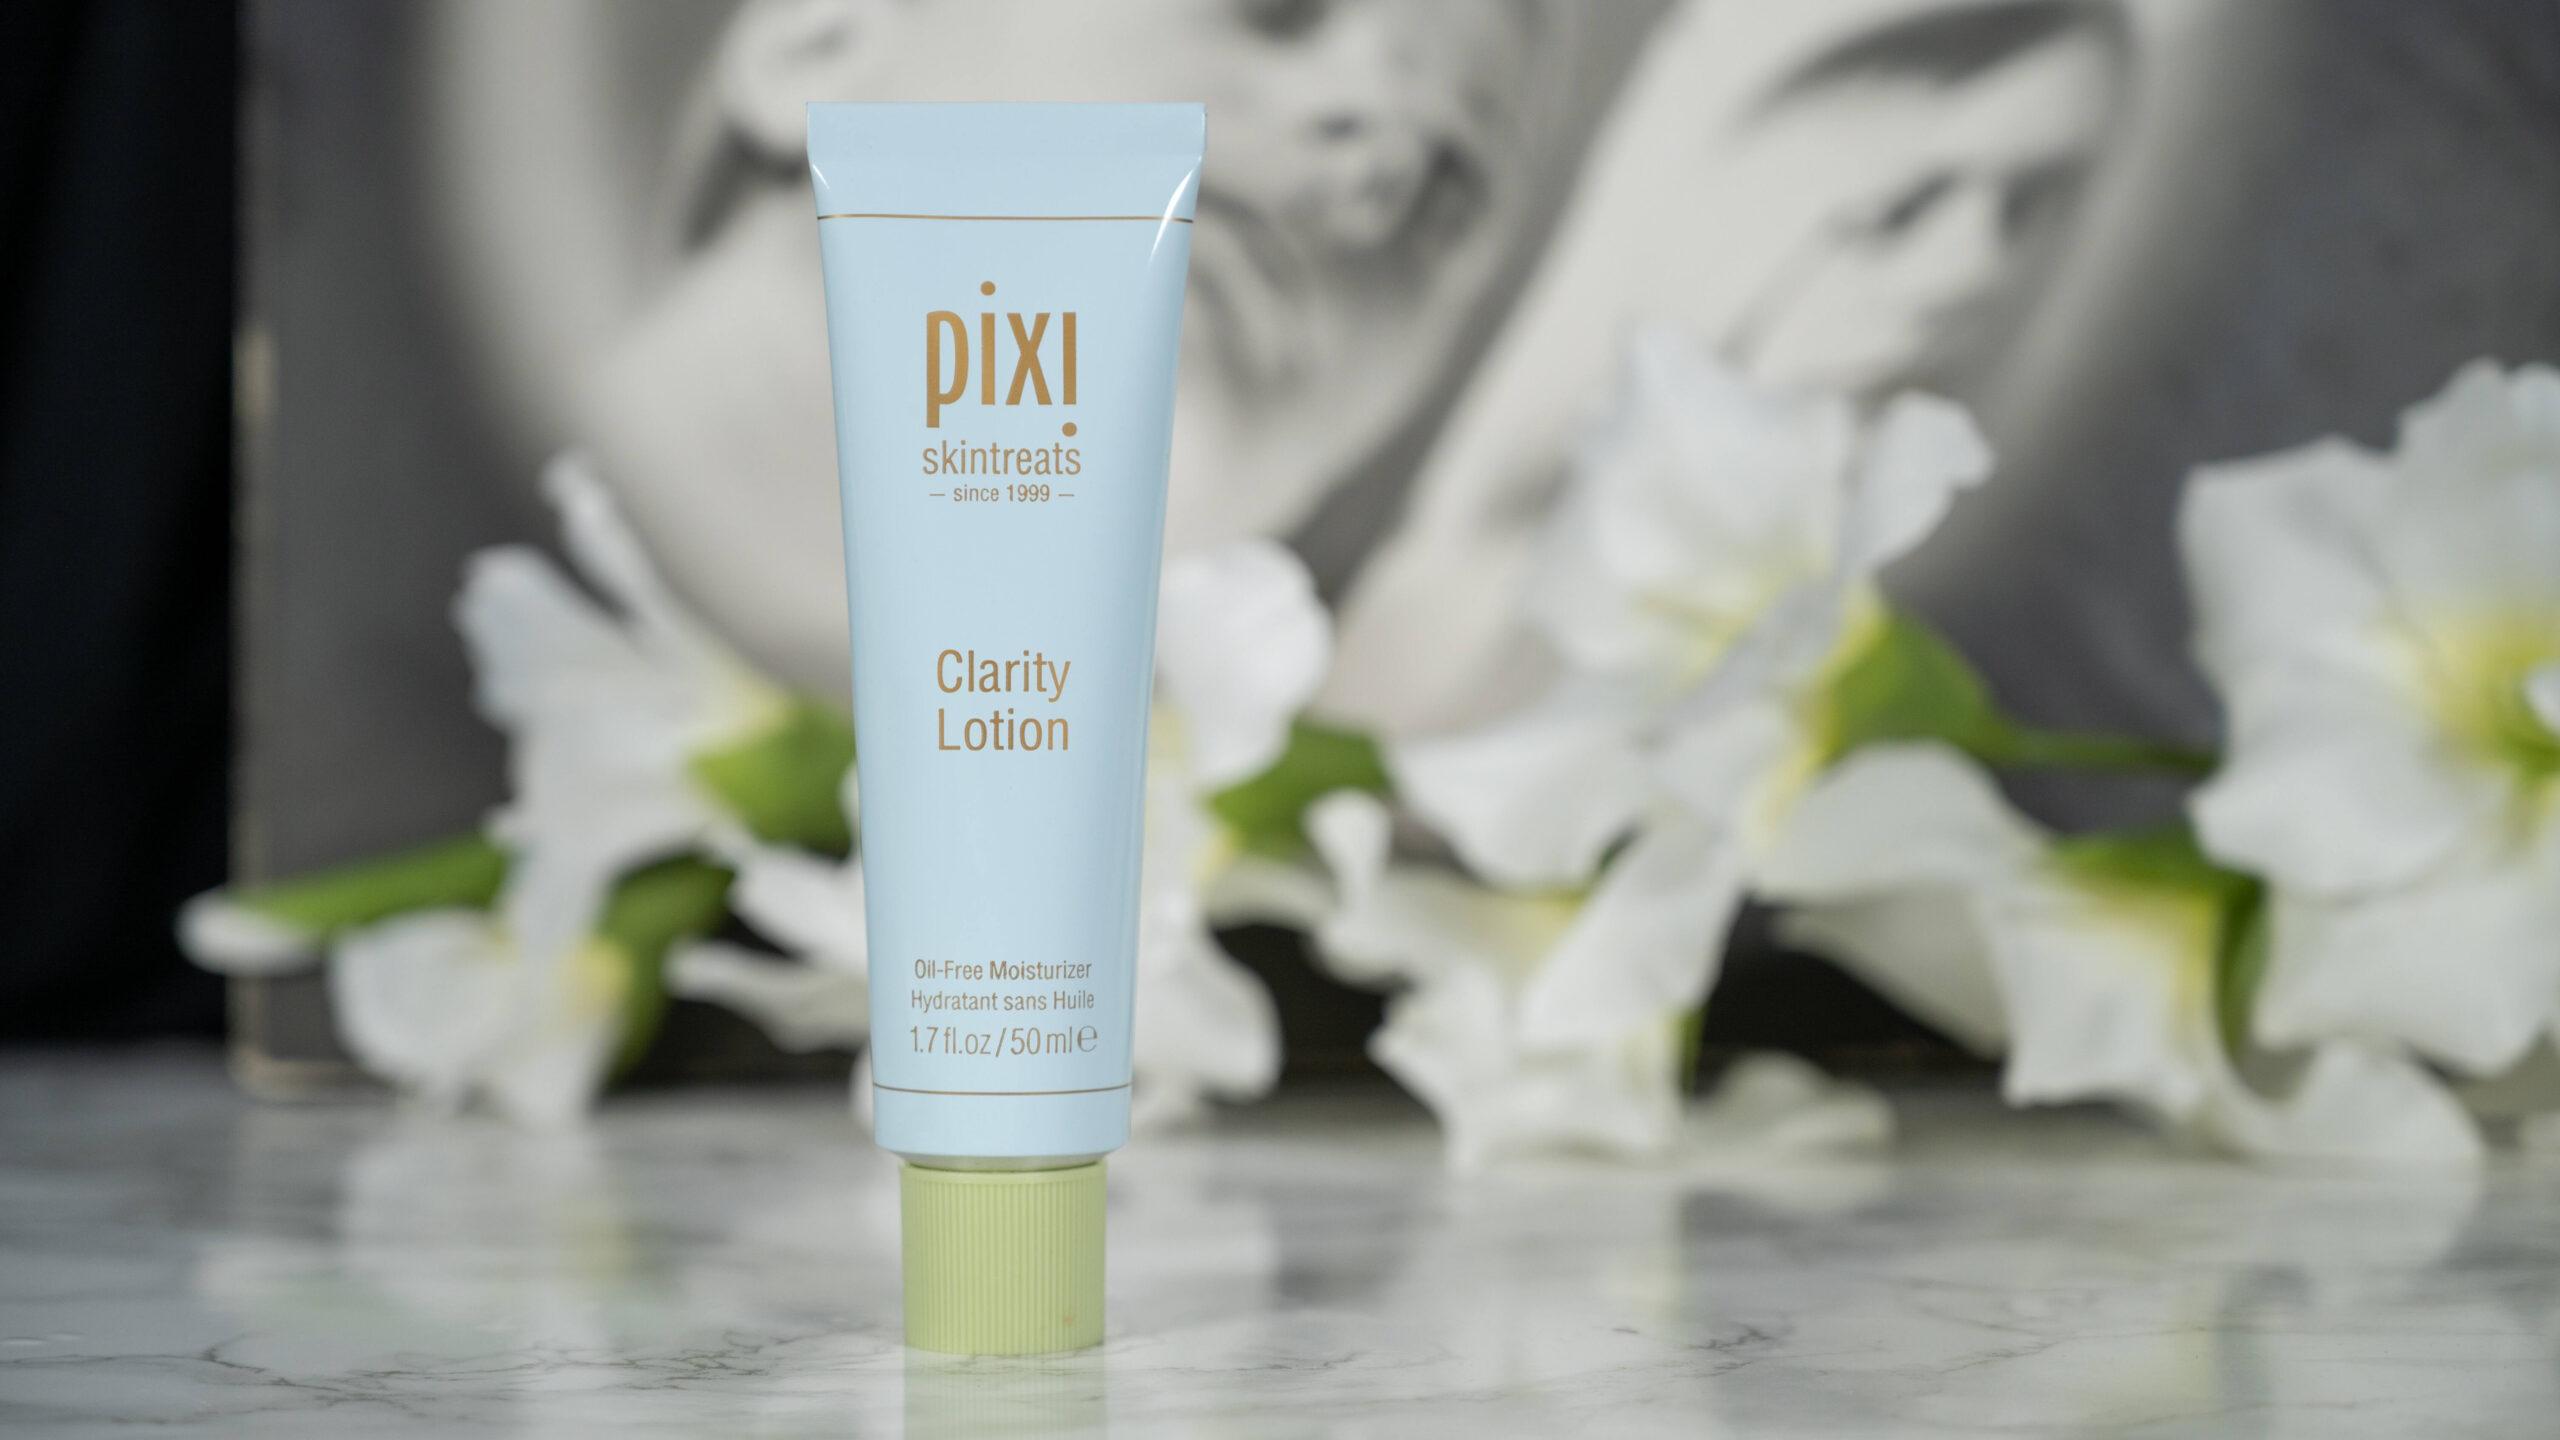 pixi Clarity Lotion